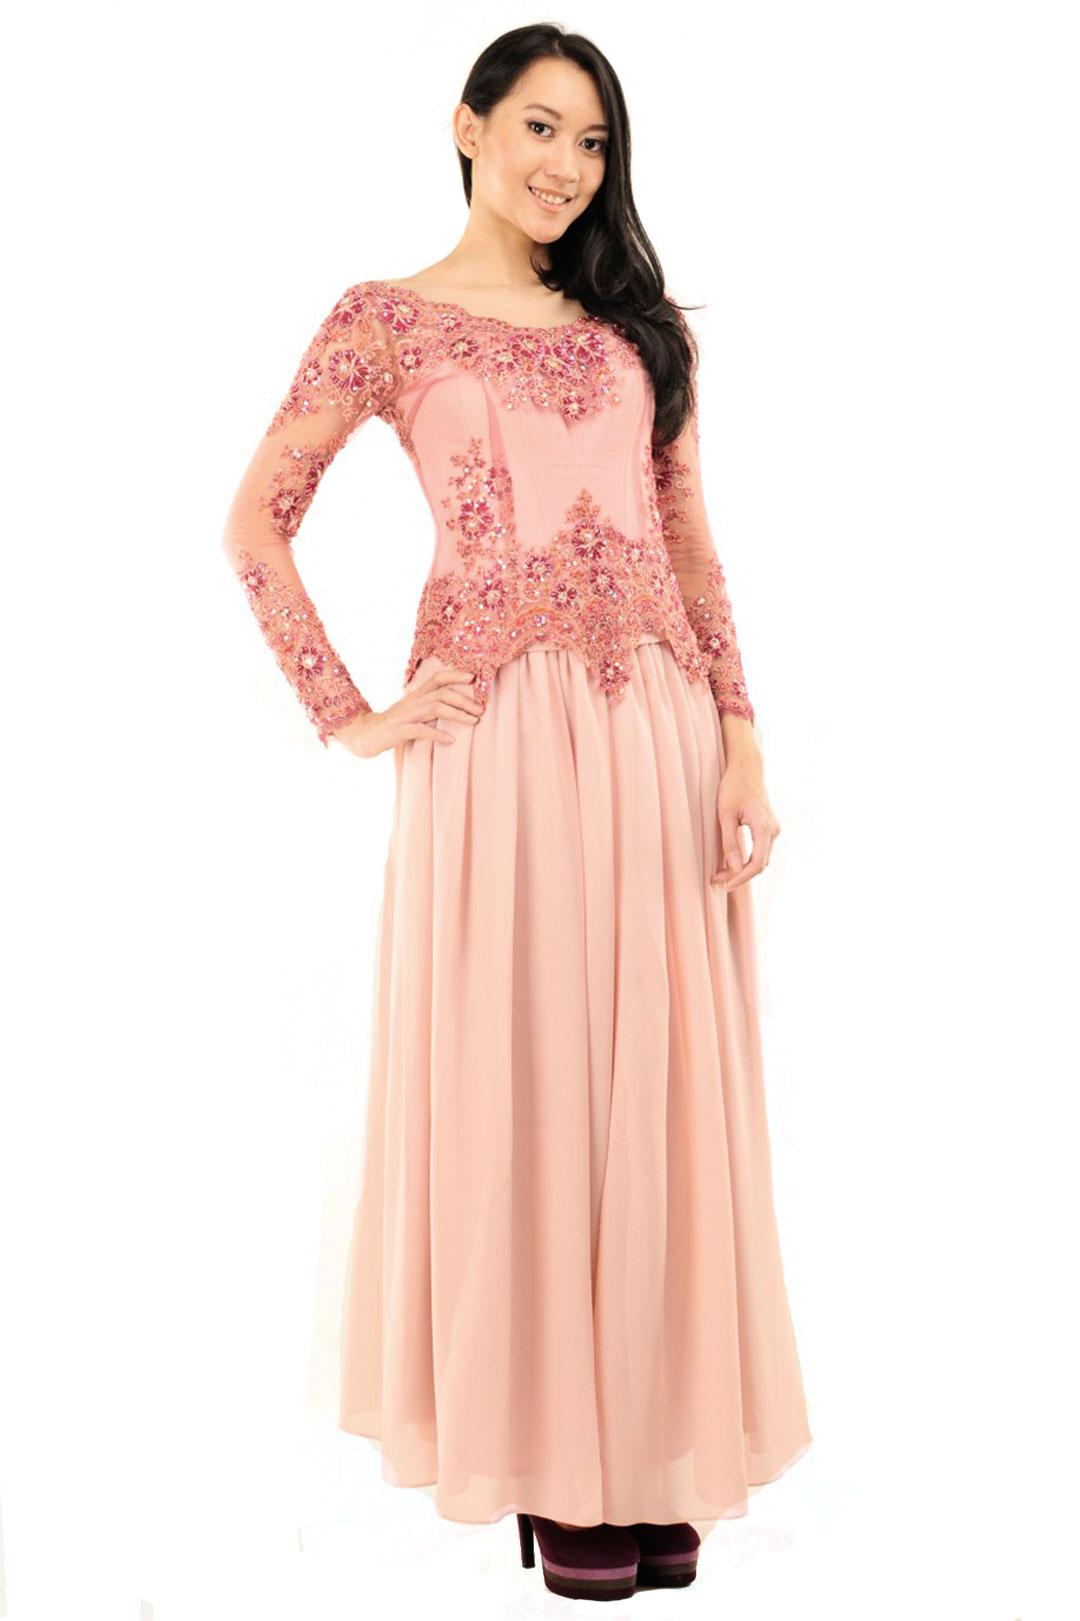 BELSBEE - Aurora Dress